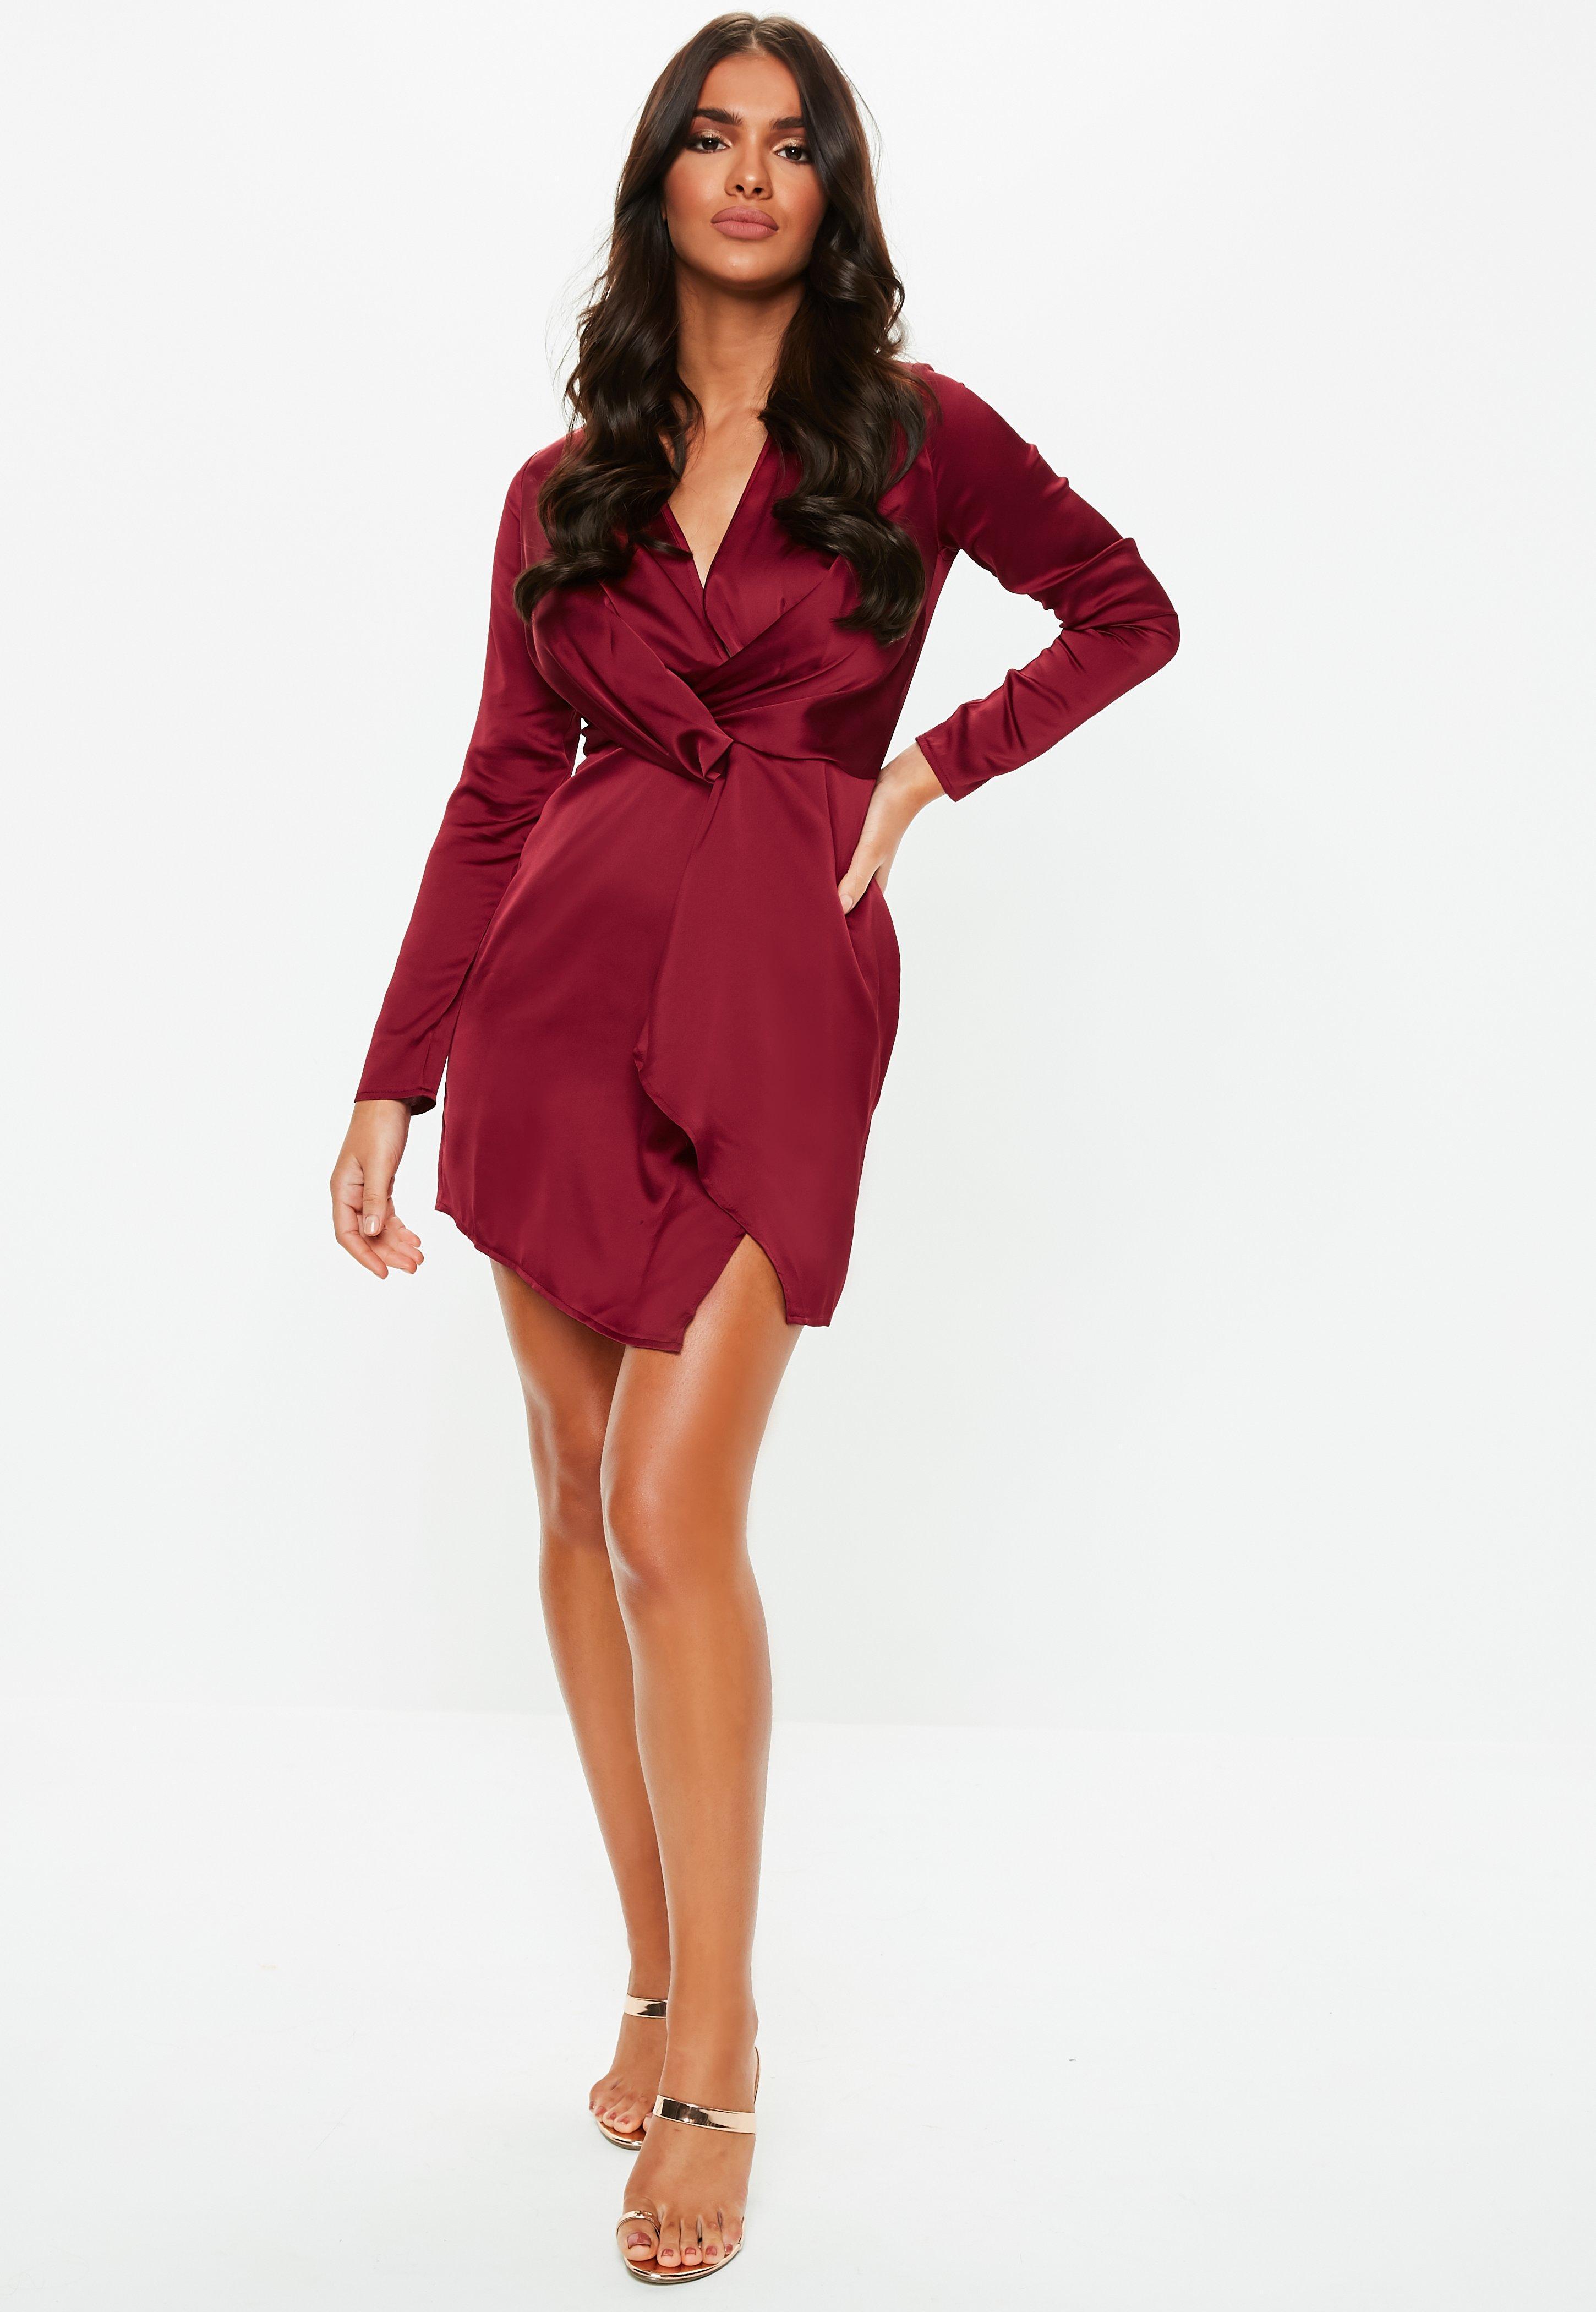 Lyst - Missguided Burgundy Silky Plunge Wrap Shift Dress in Red f0eca1edb